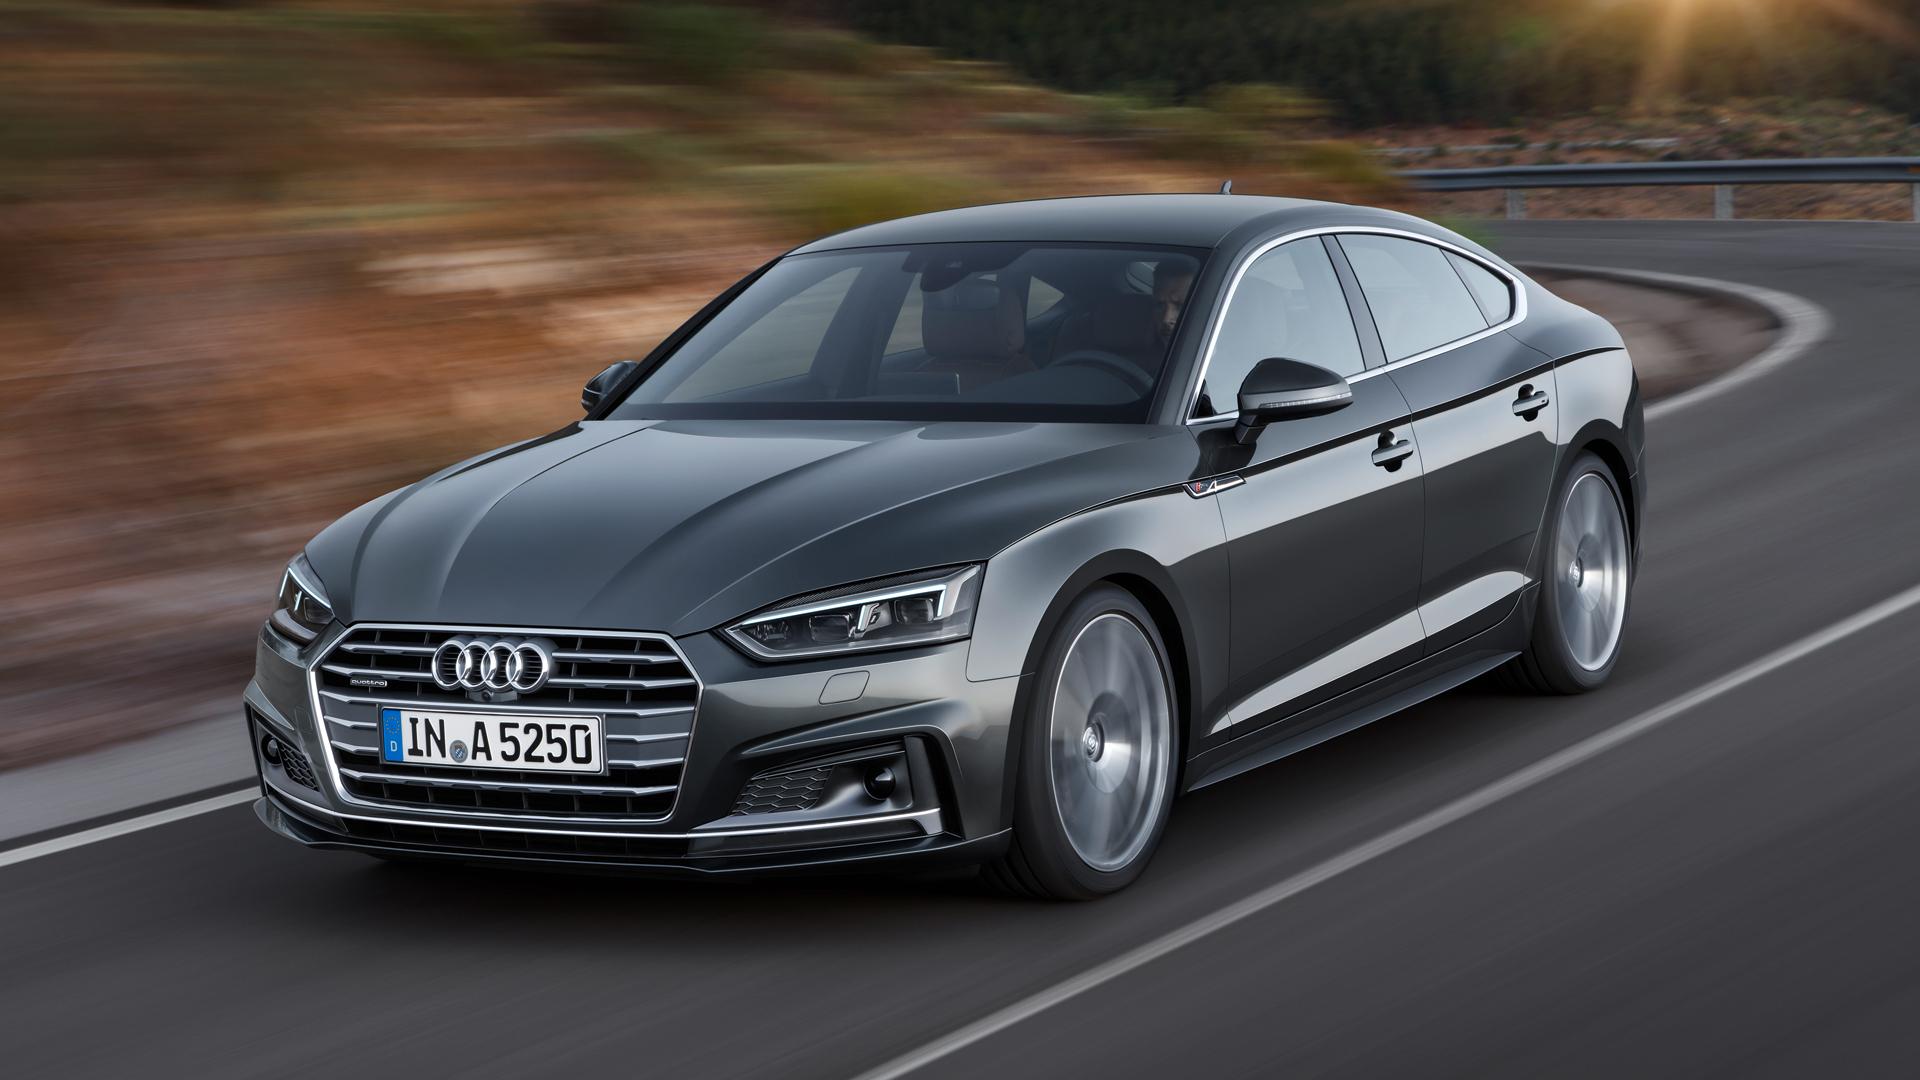 Reprogrammation Audi A5 35 TDI (2.0D) 150